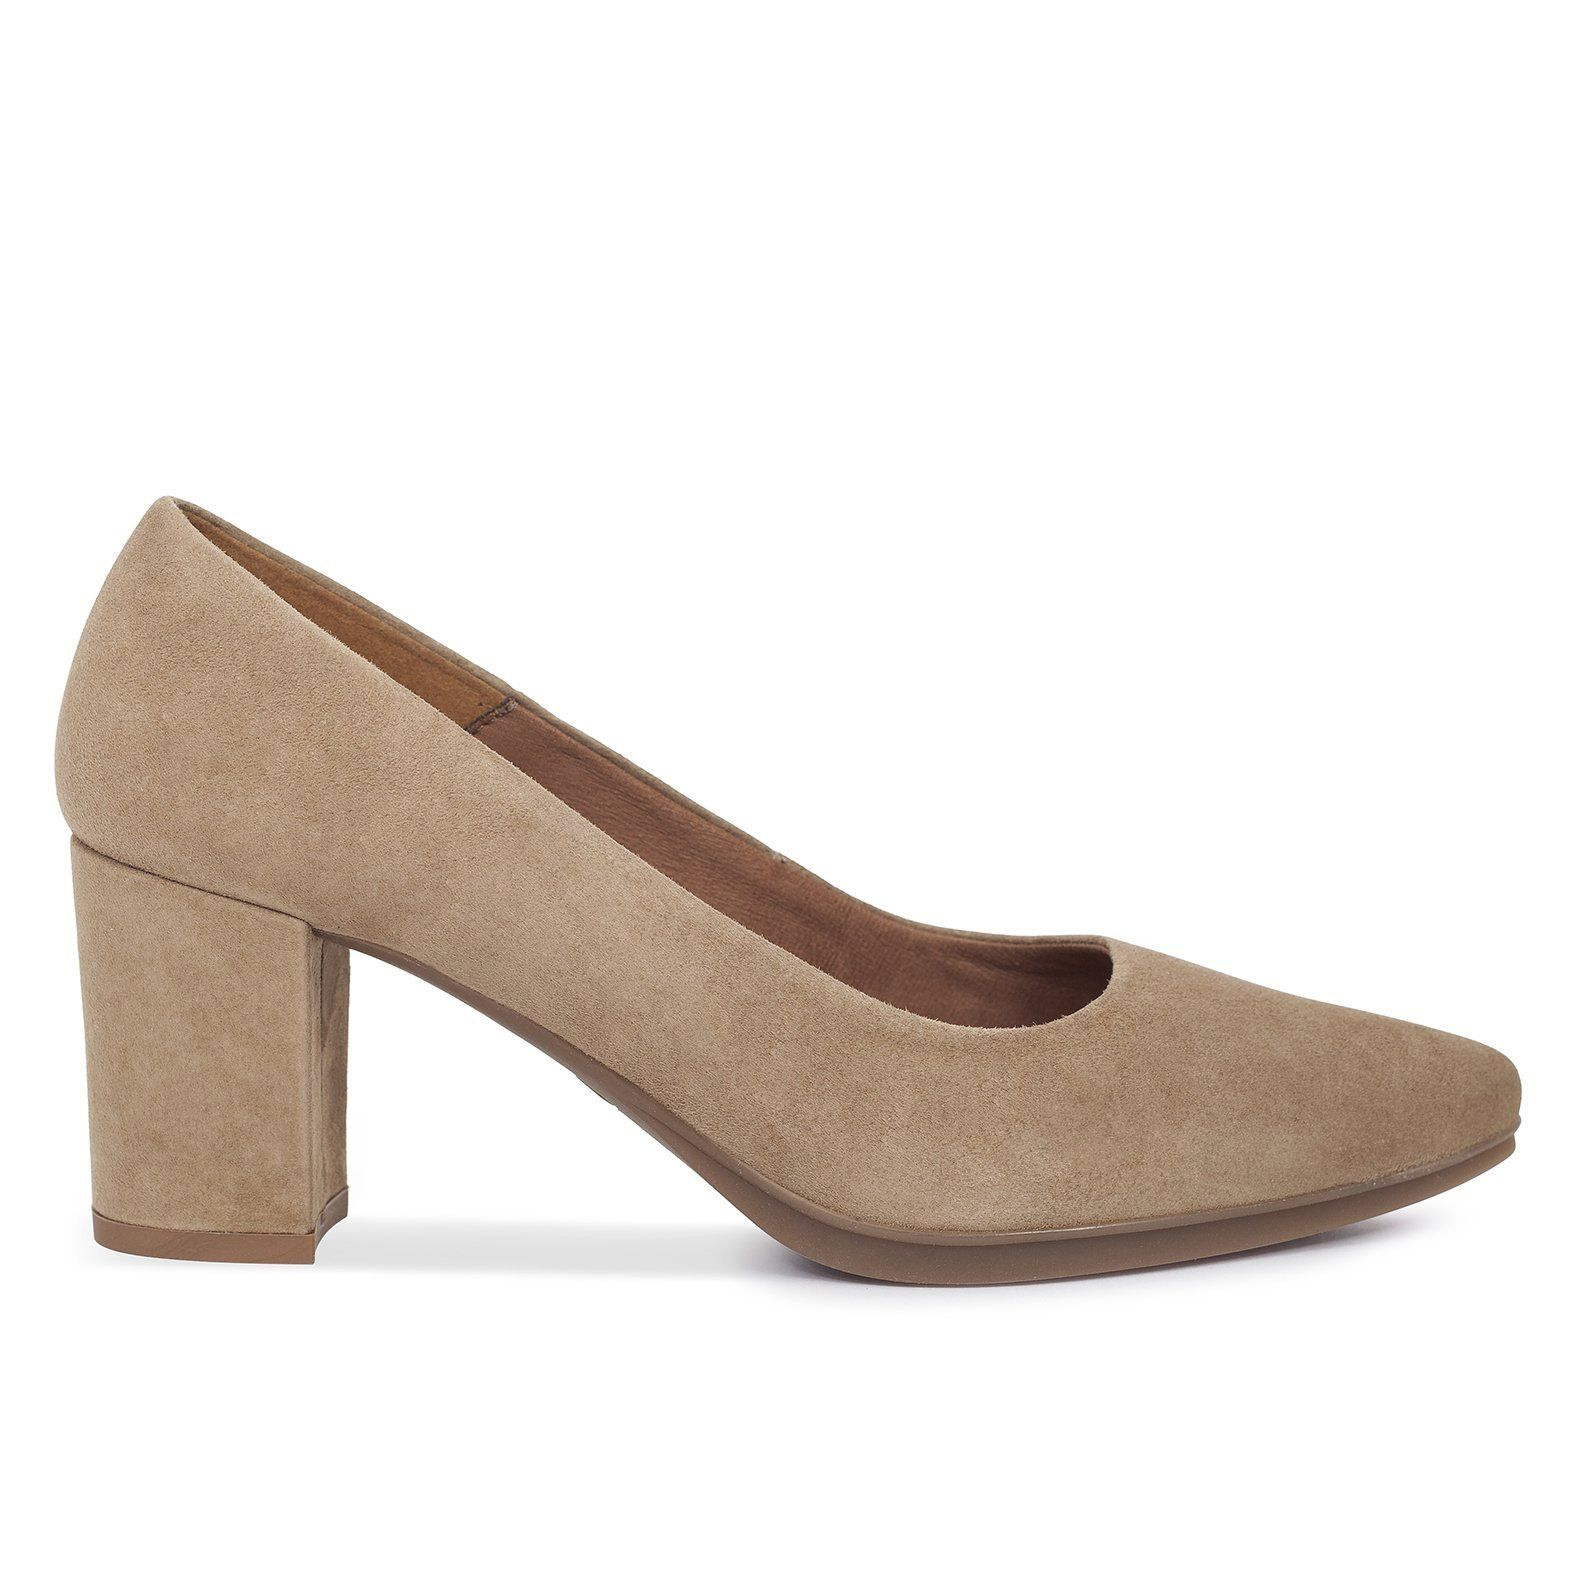 39742e25 Zapatos mujer tacón bajo BEIGE ARENA Urban S - Zapatos online miMaO – miMaO  ShopOnline